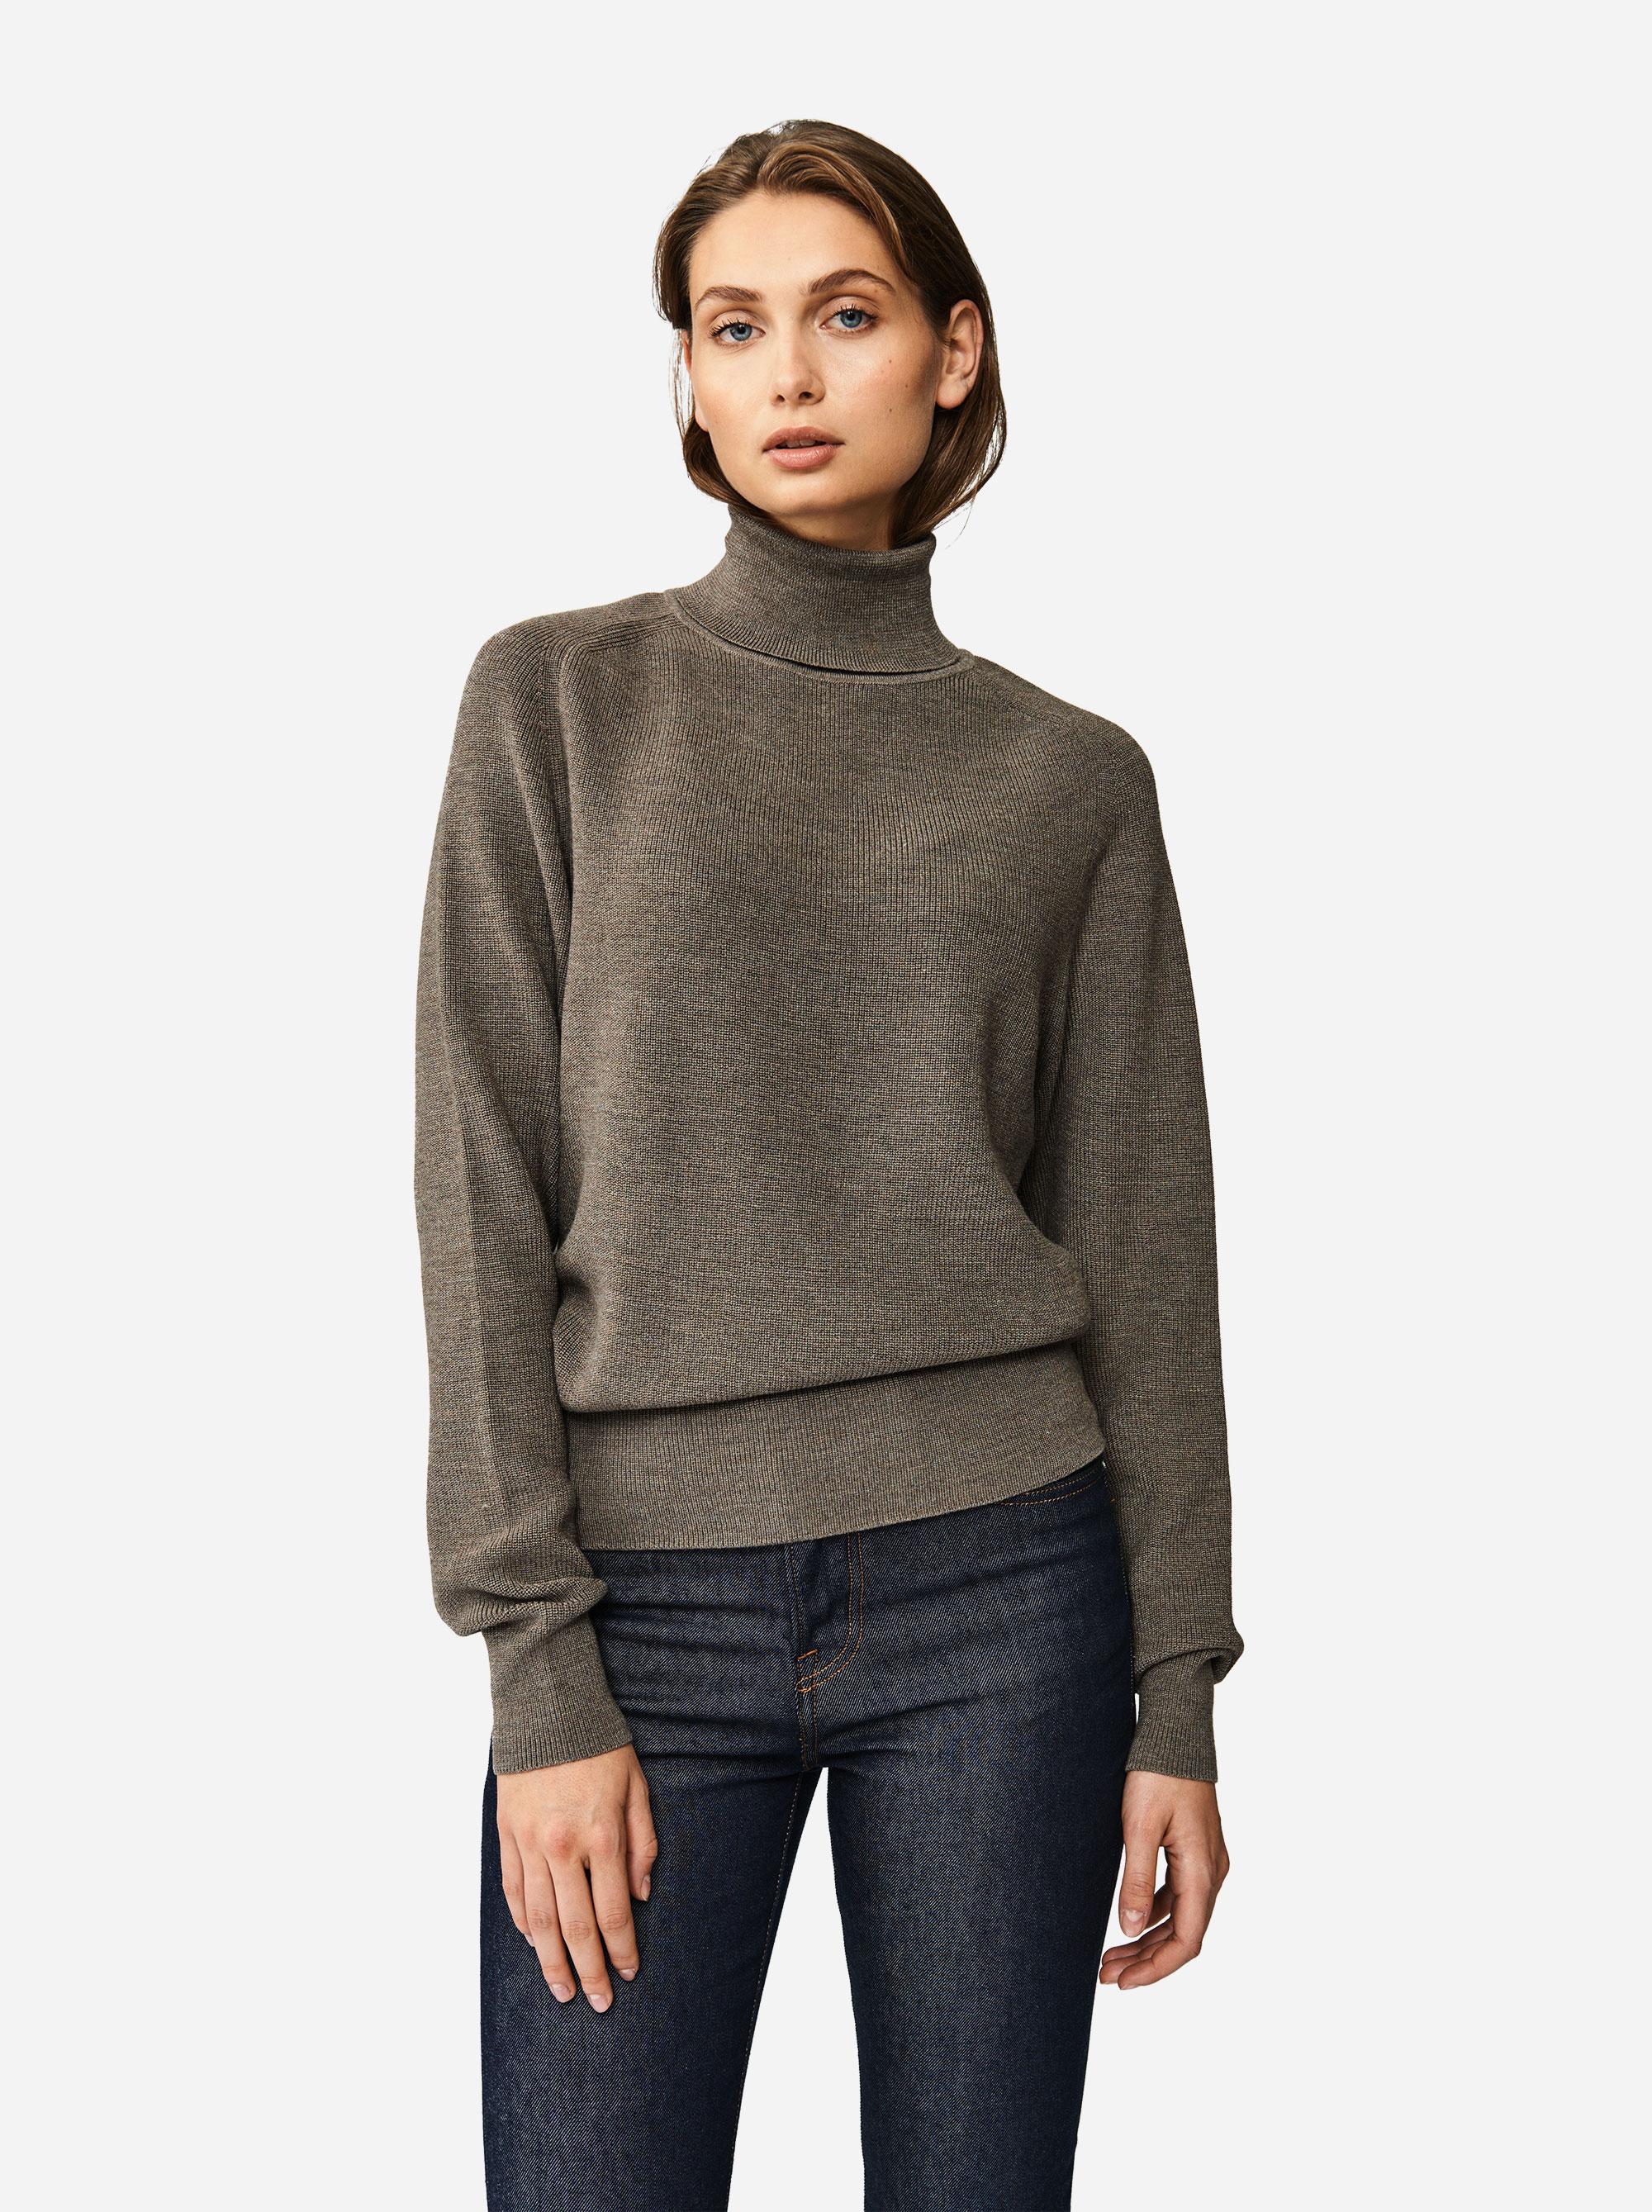 Teym - Turtleneck - The Merino Sweater - Men - Grey - 1